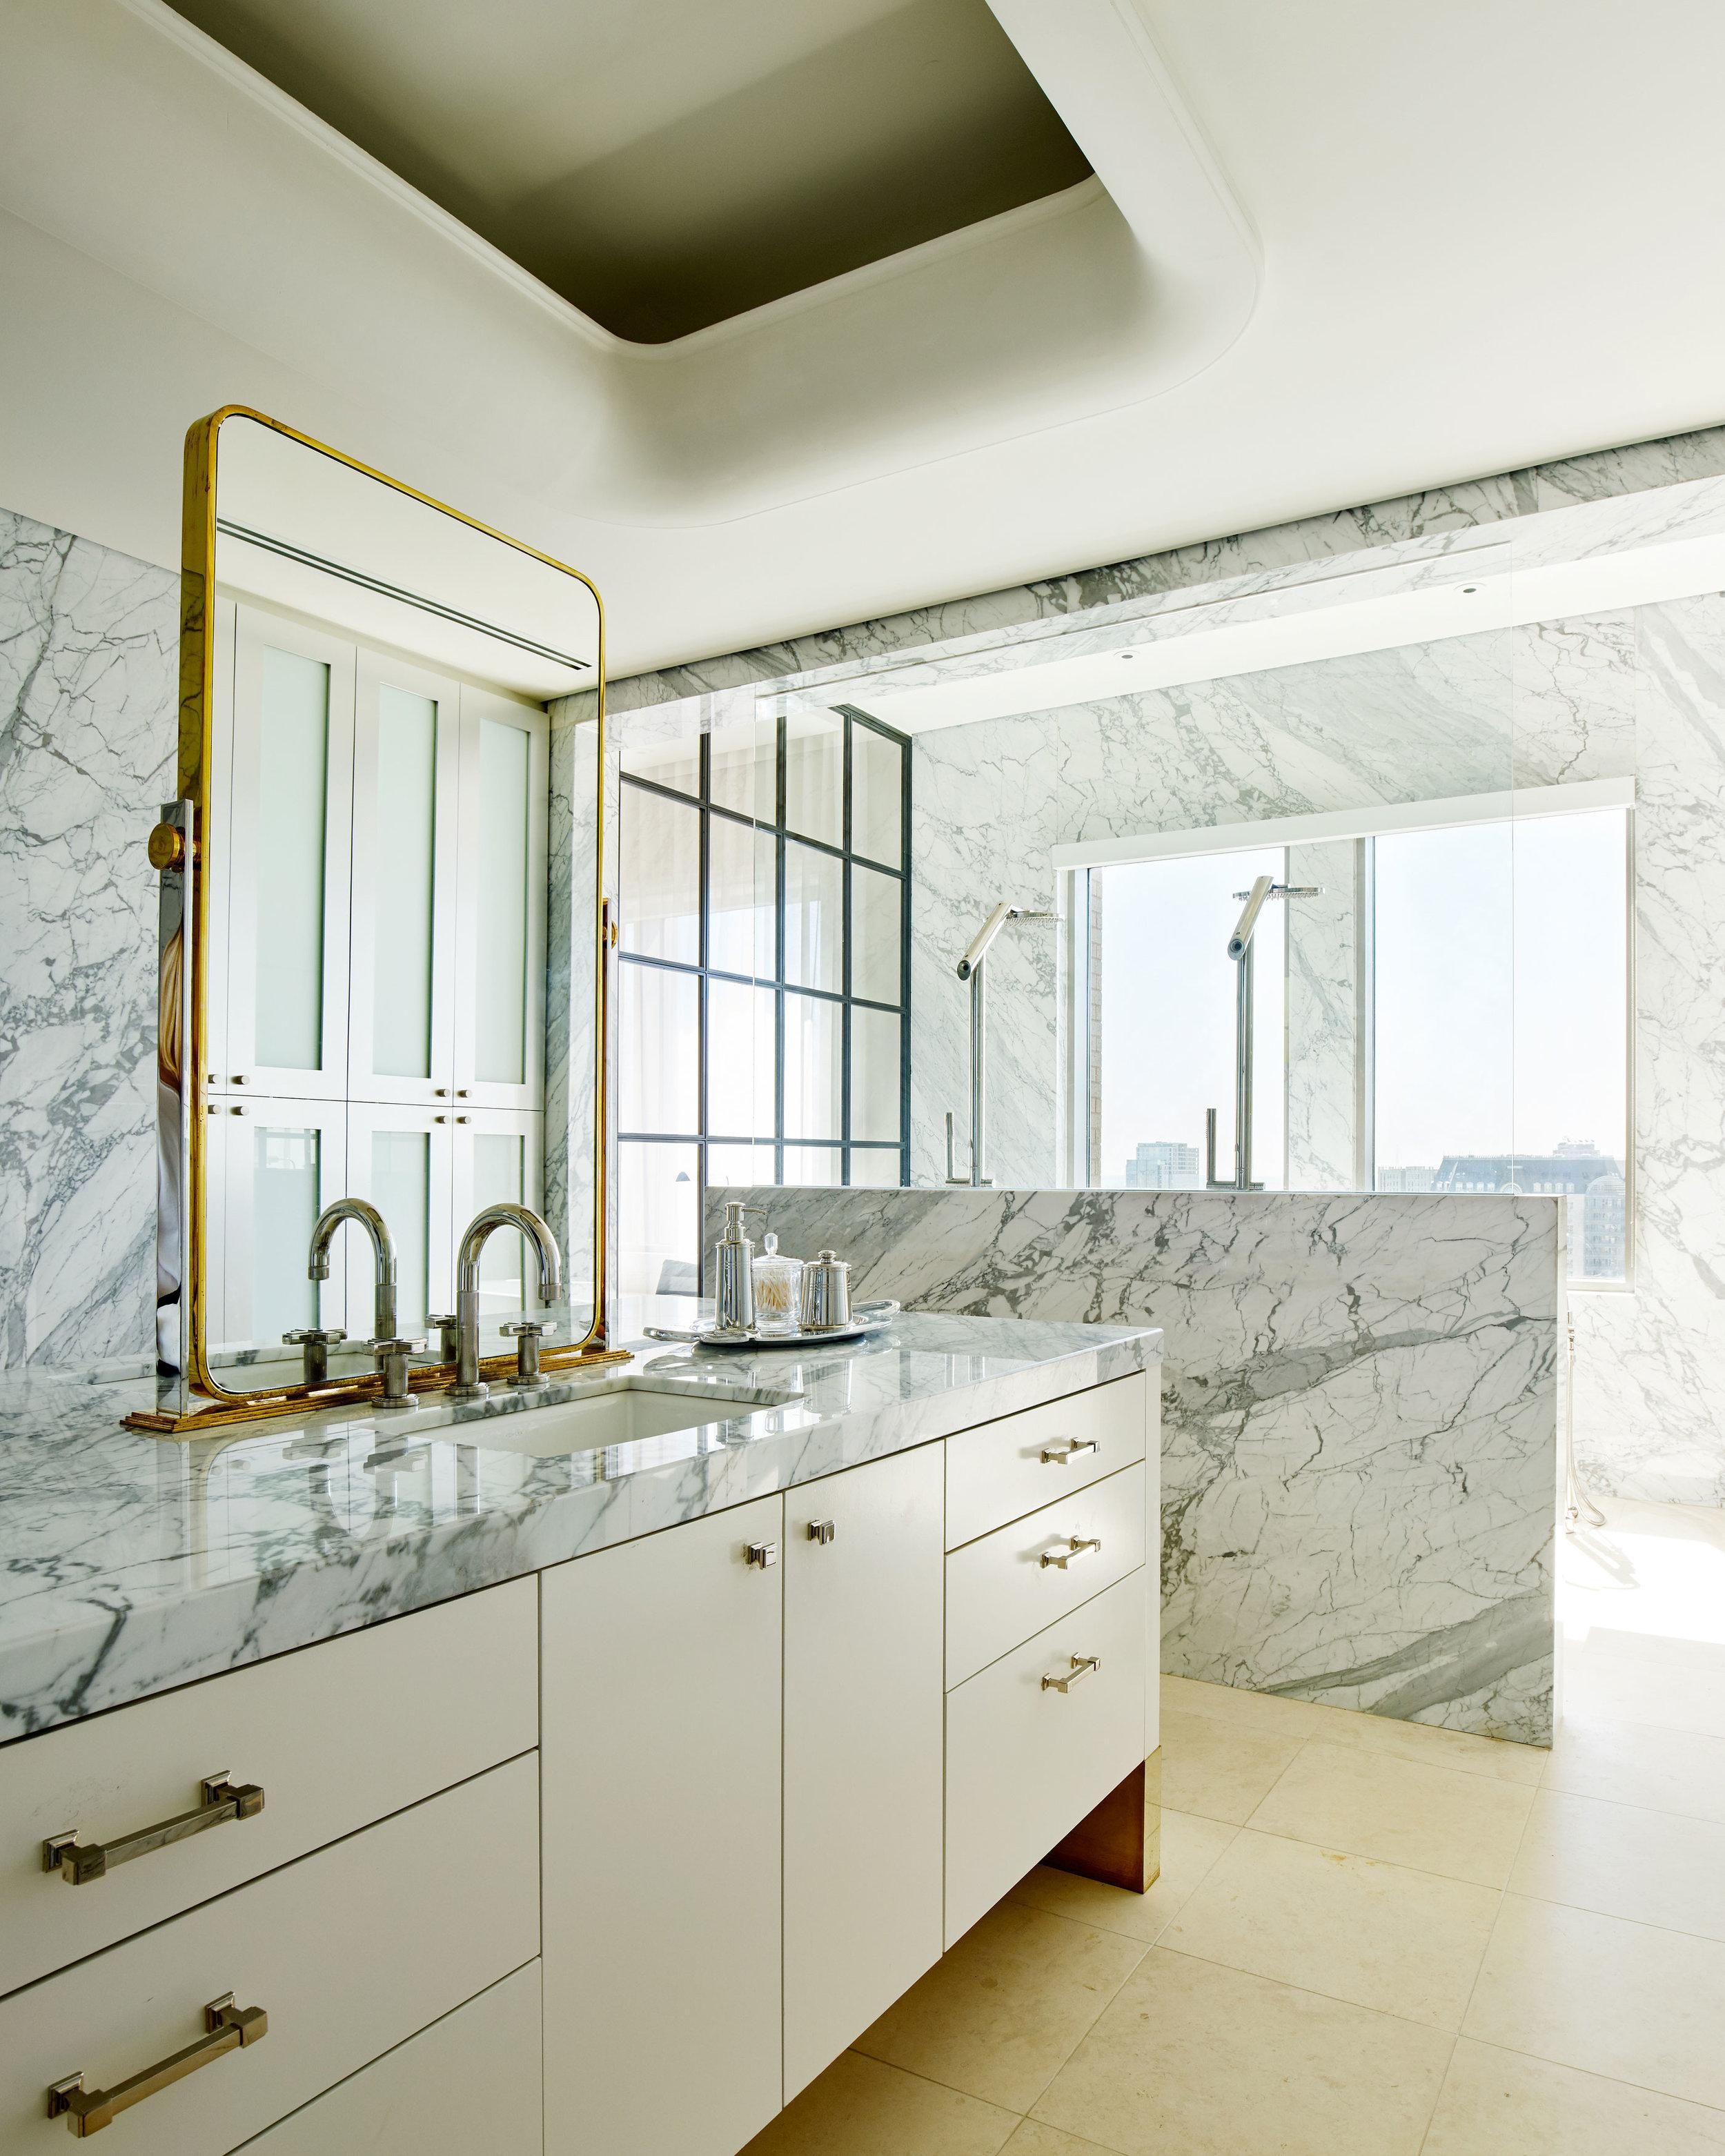 Stephen Karlisch Brant McFarlain Bathroom